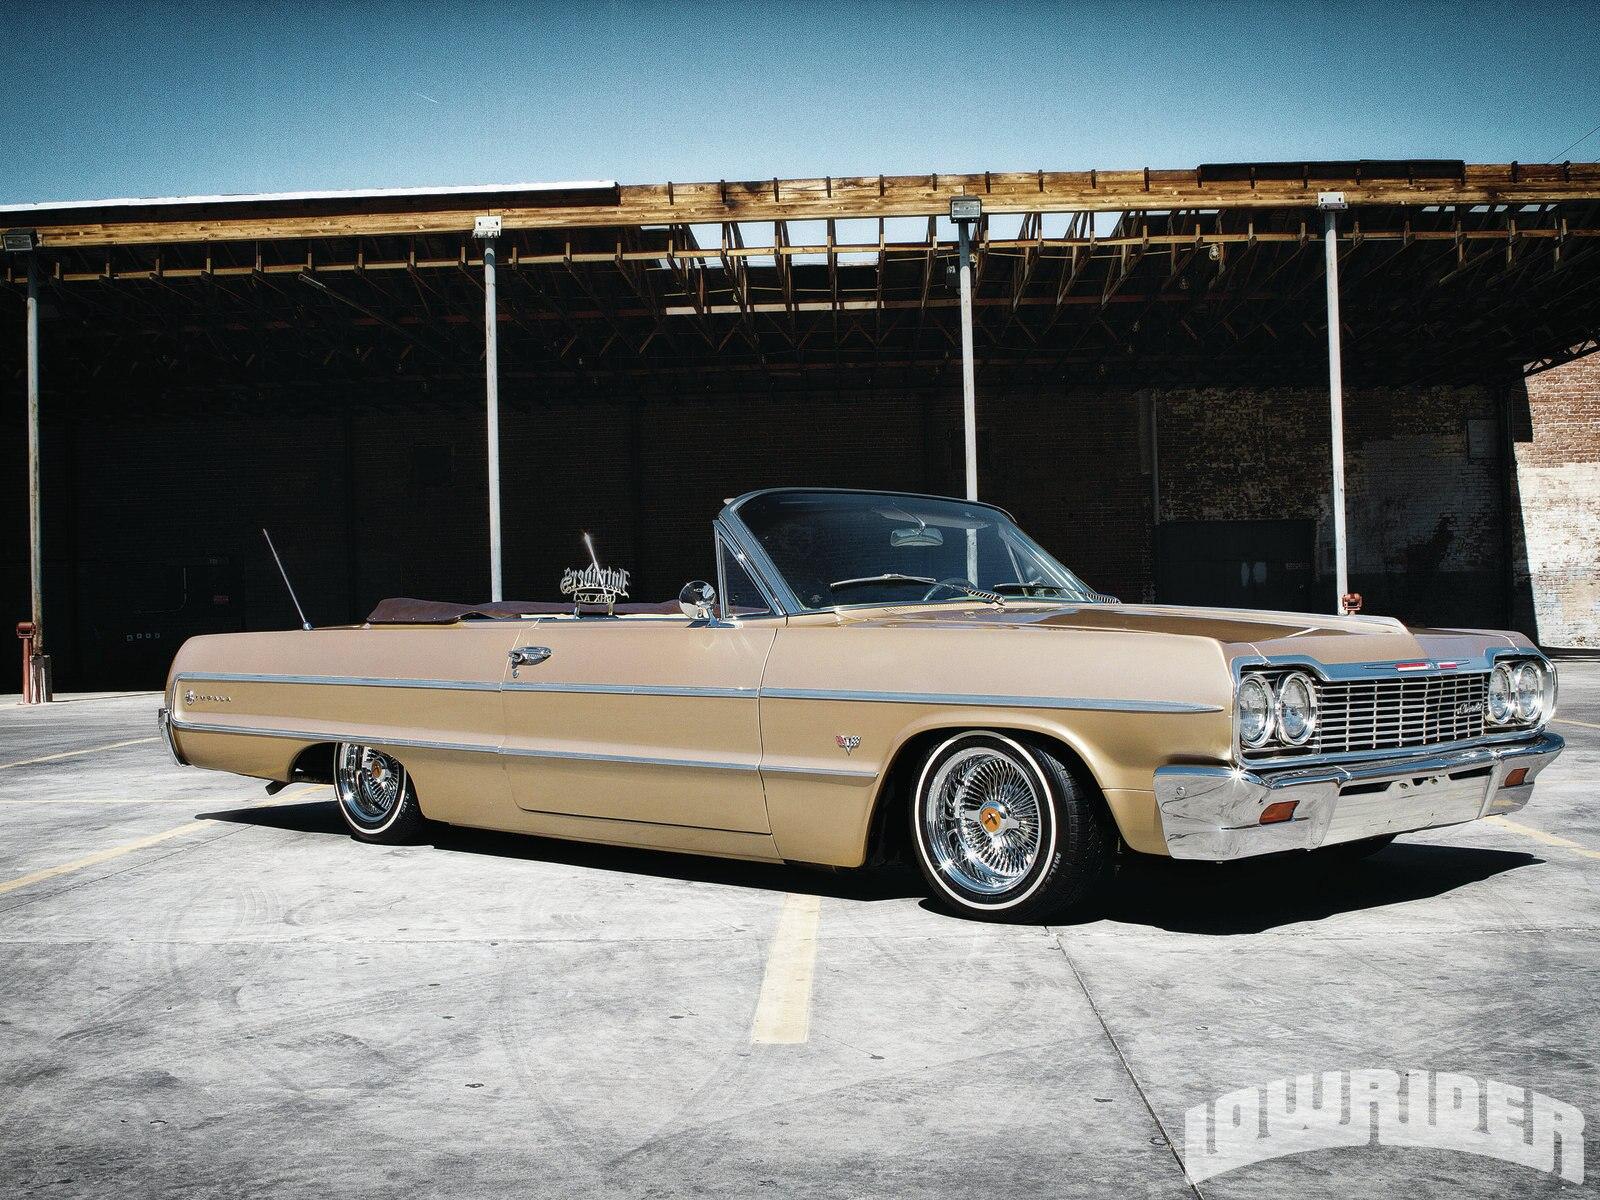 1964 Chevrolet Impala Lowrider Lowrider Magazine